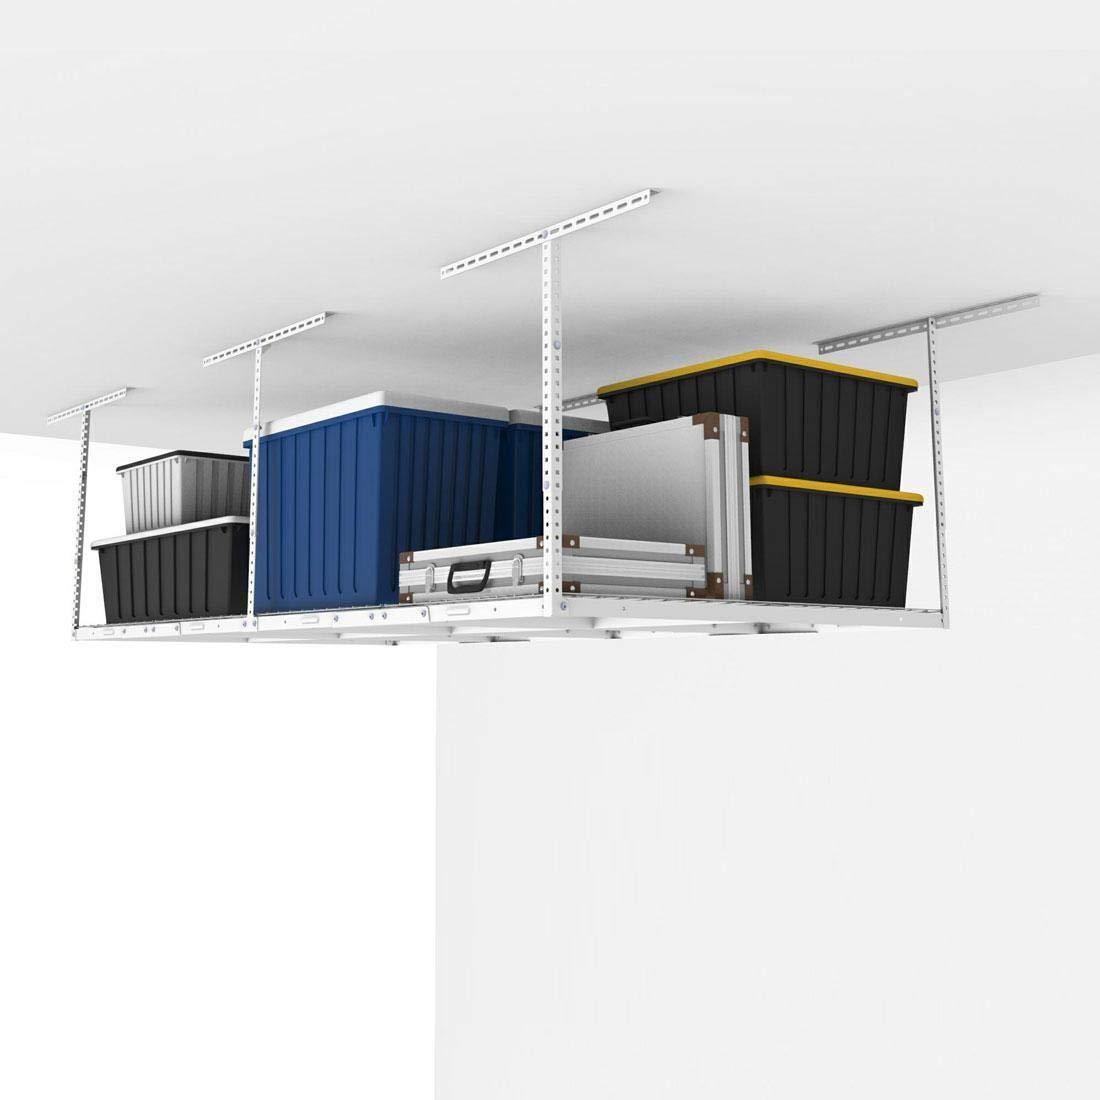 Fleximounts 4x8 Overhead Garage Storage Rack Adjustable Ceiling Storage Rack Heavy Duty, 96'' Length x 48'' Width x (22.5''-40'' Ceiling Dropdown), White by FLEXIMOUNTS